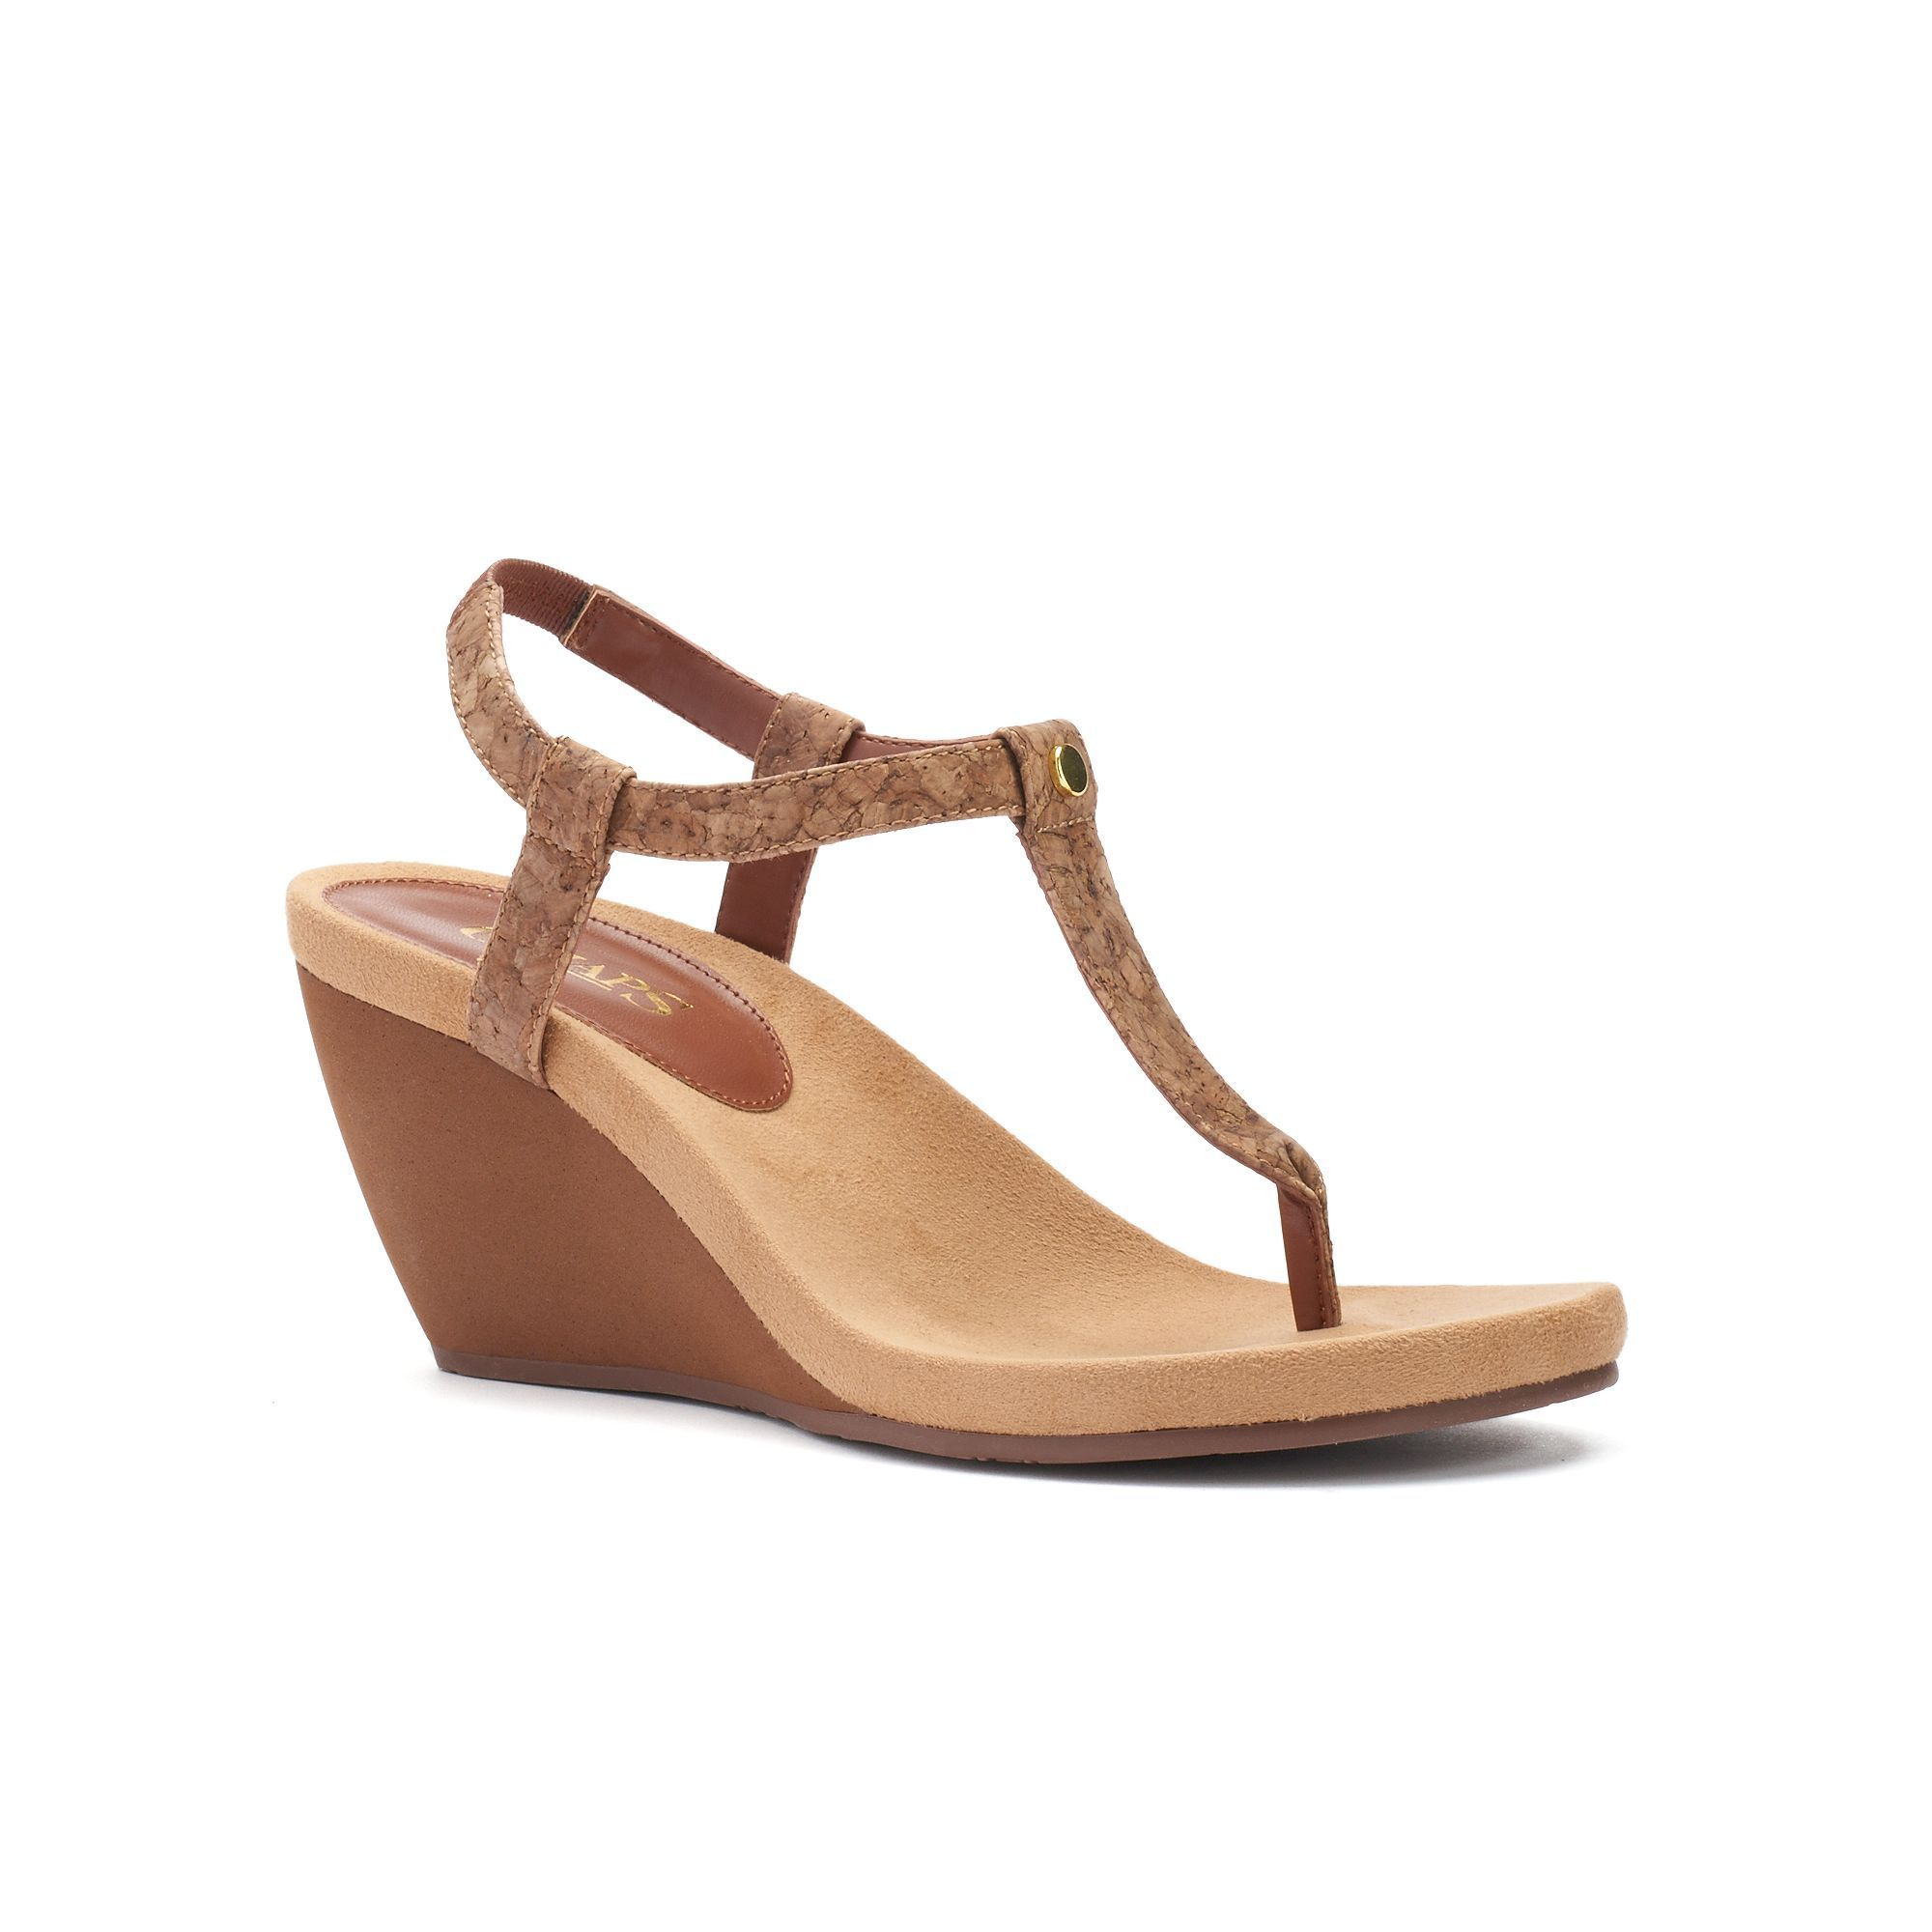 Chaps Raevyn Women's Slip On Wedge Sandals | Wedge sandals